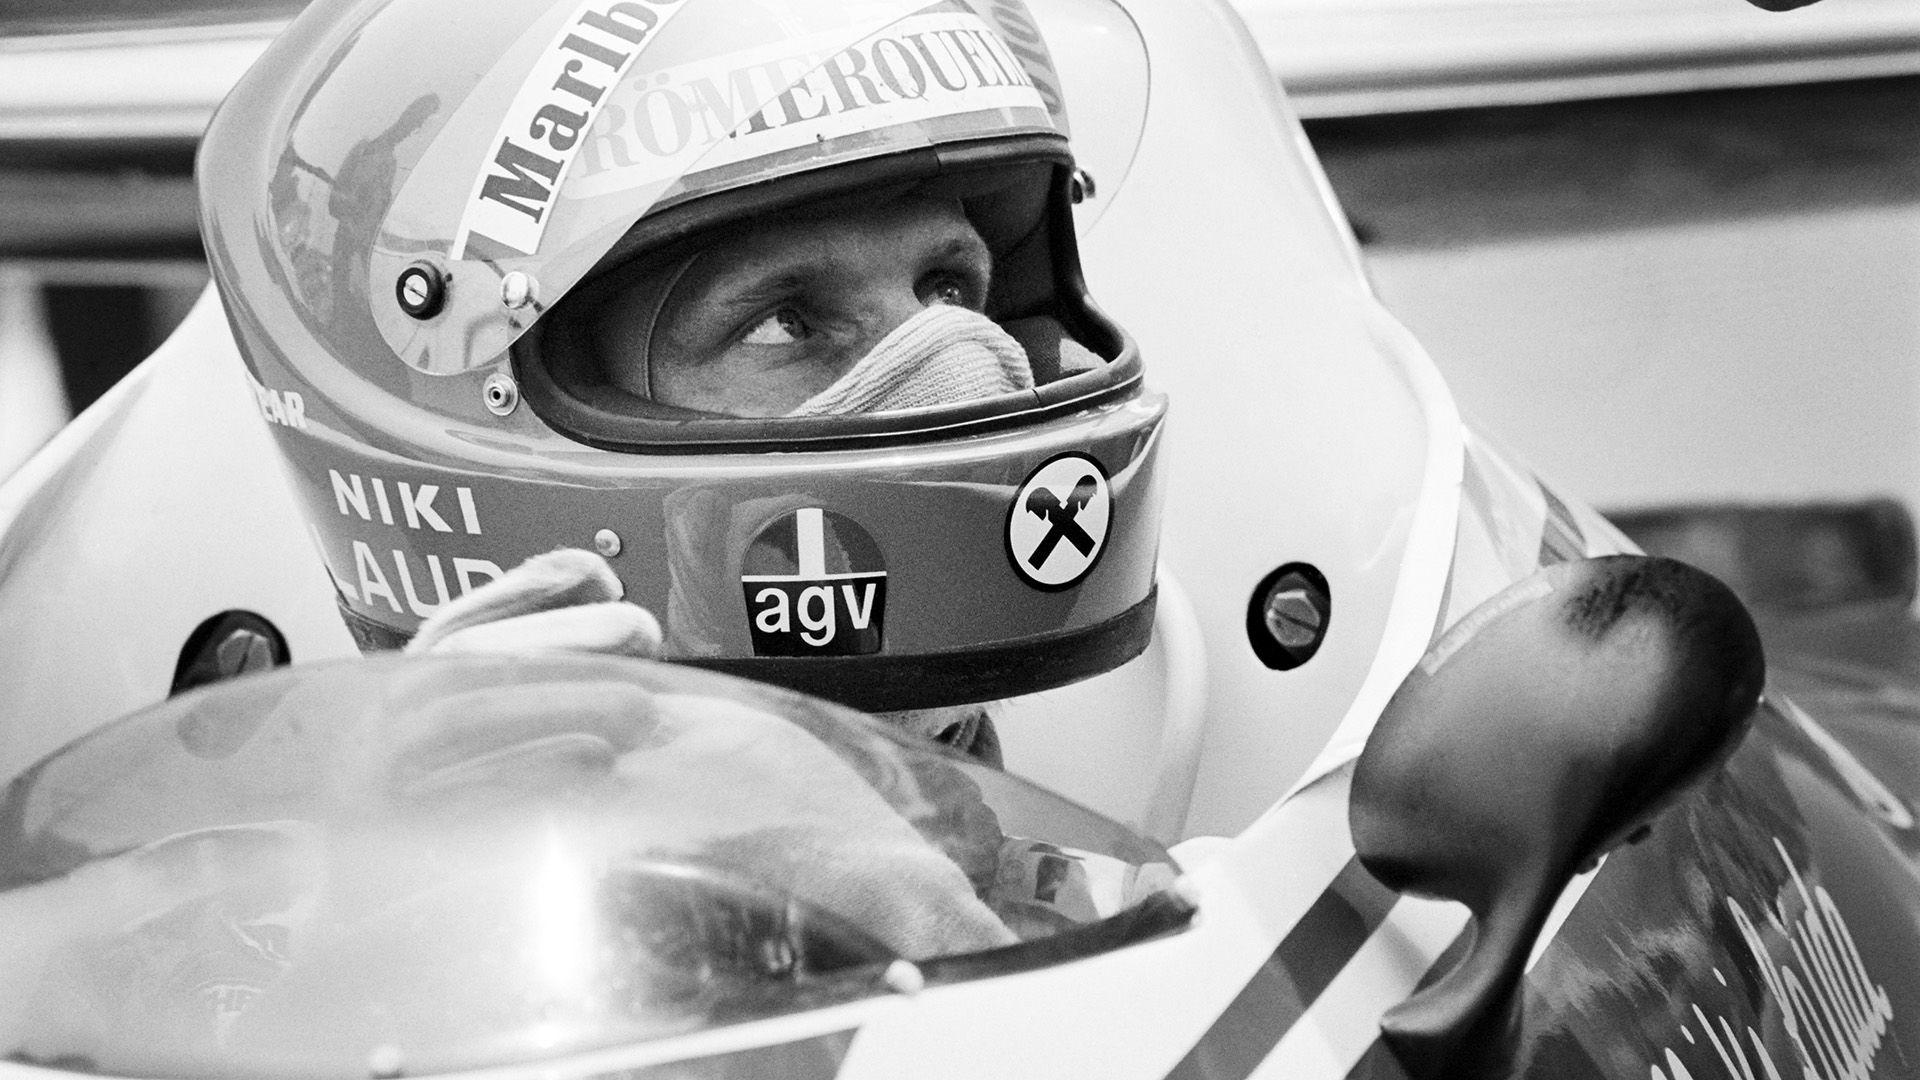 Niki Lauda en Mónaco 1976 (Photo by - / AFP)